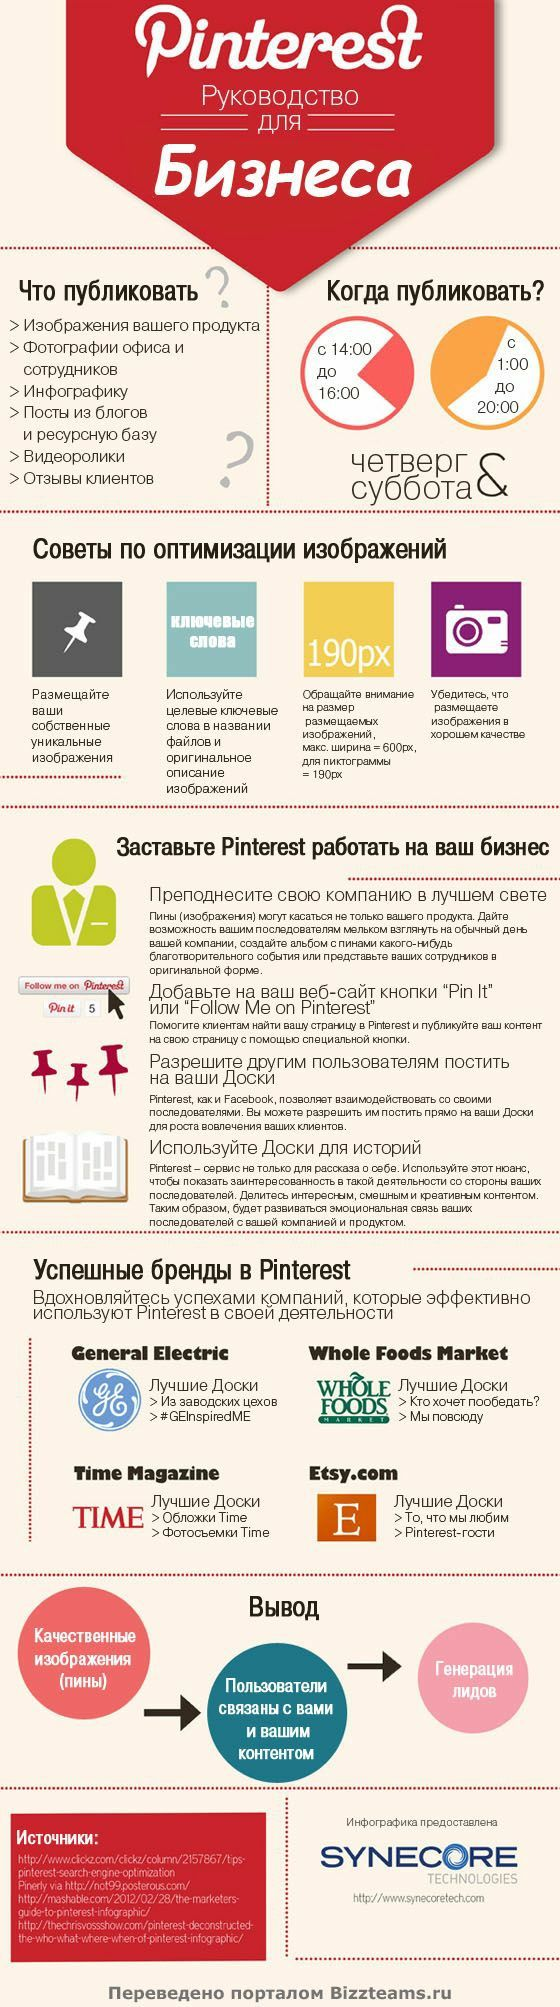 PINTEREST-РУКОВОДСТВО ДЛЯ БИЗНЕСА http://statictab.com/yxxo9wo